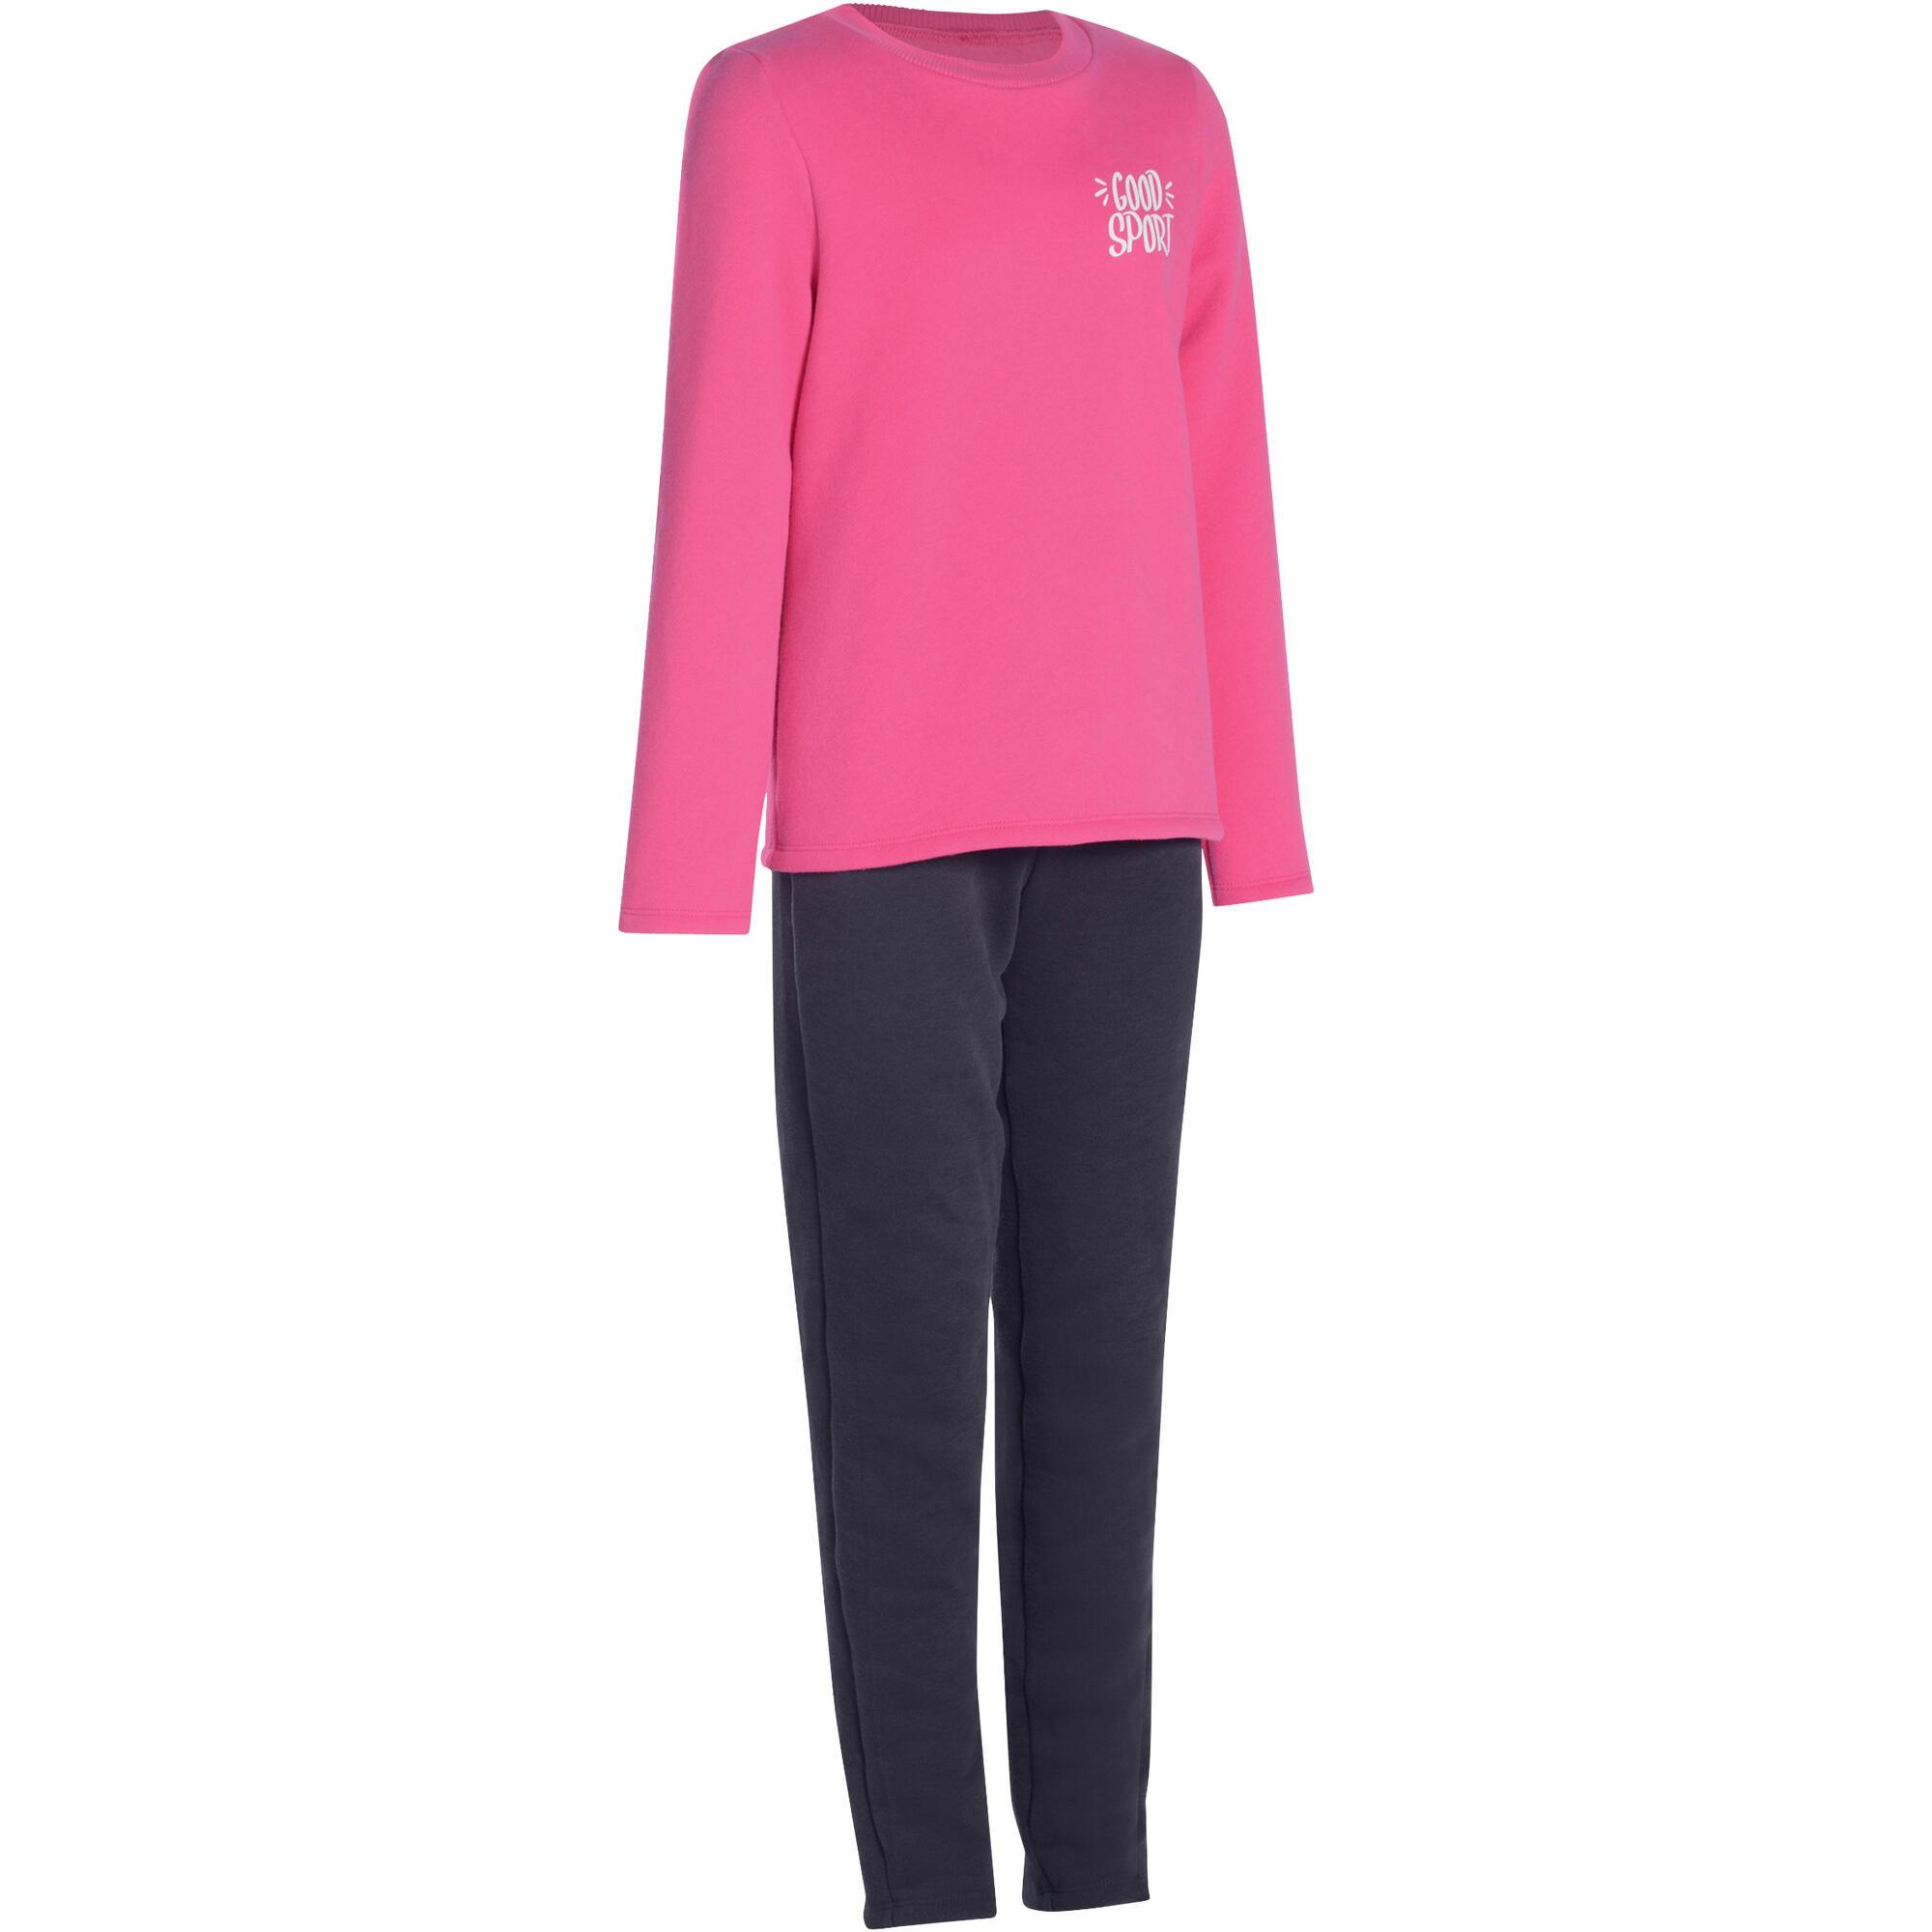 c6d61b487d56a Chándal 100 gimnasia niña rosa estampado Warm y